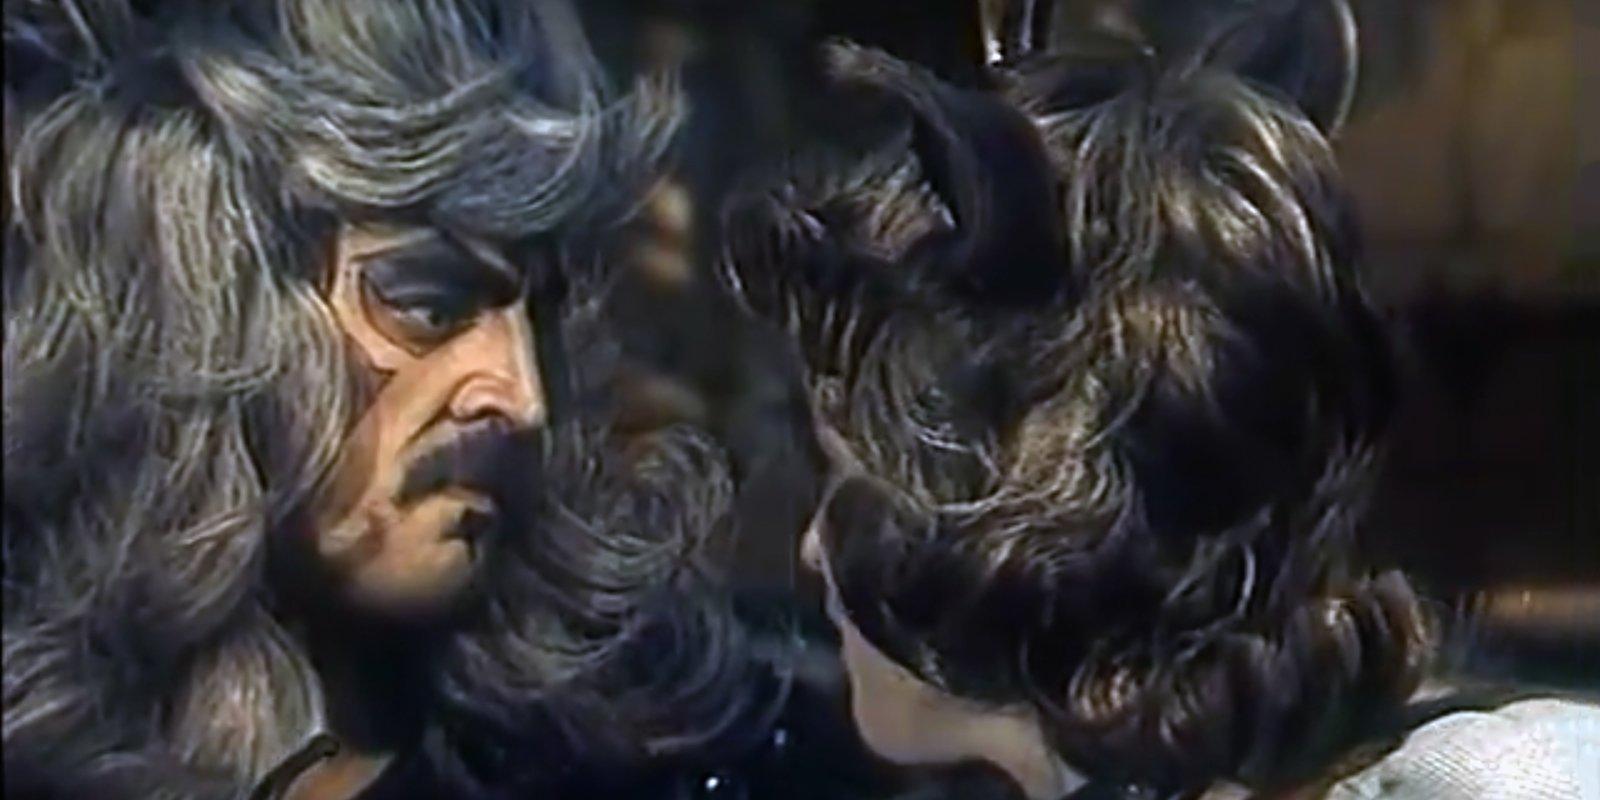 Кадр из фильма «Мама». Режиссер Элизабета Бостан. 1976 год